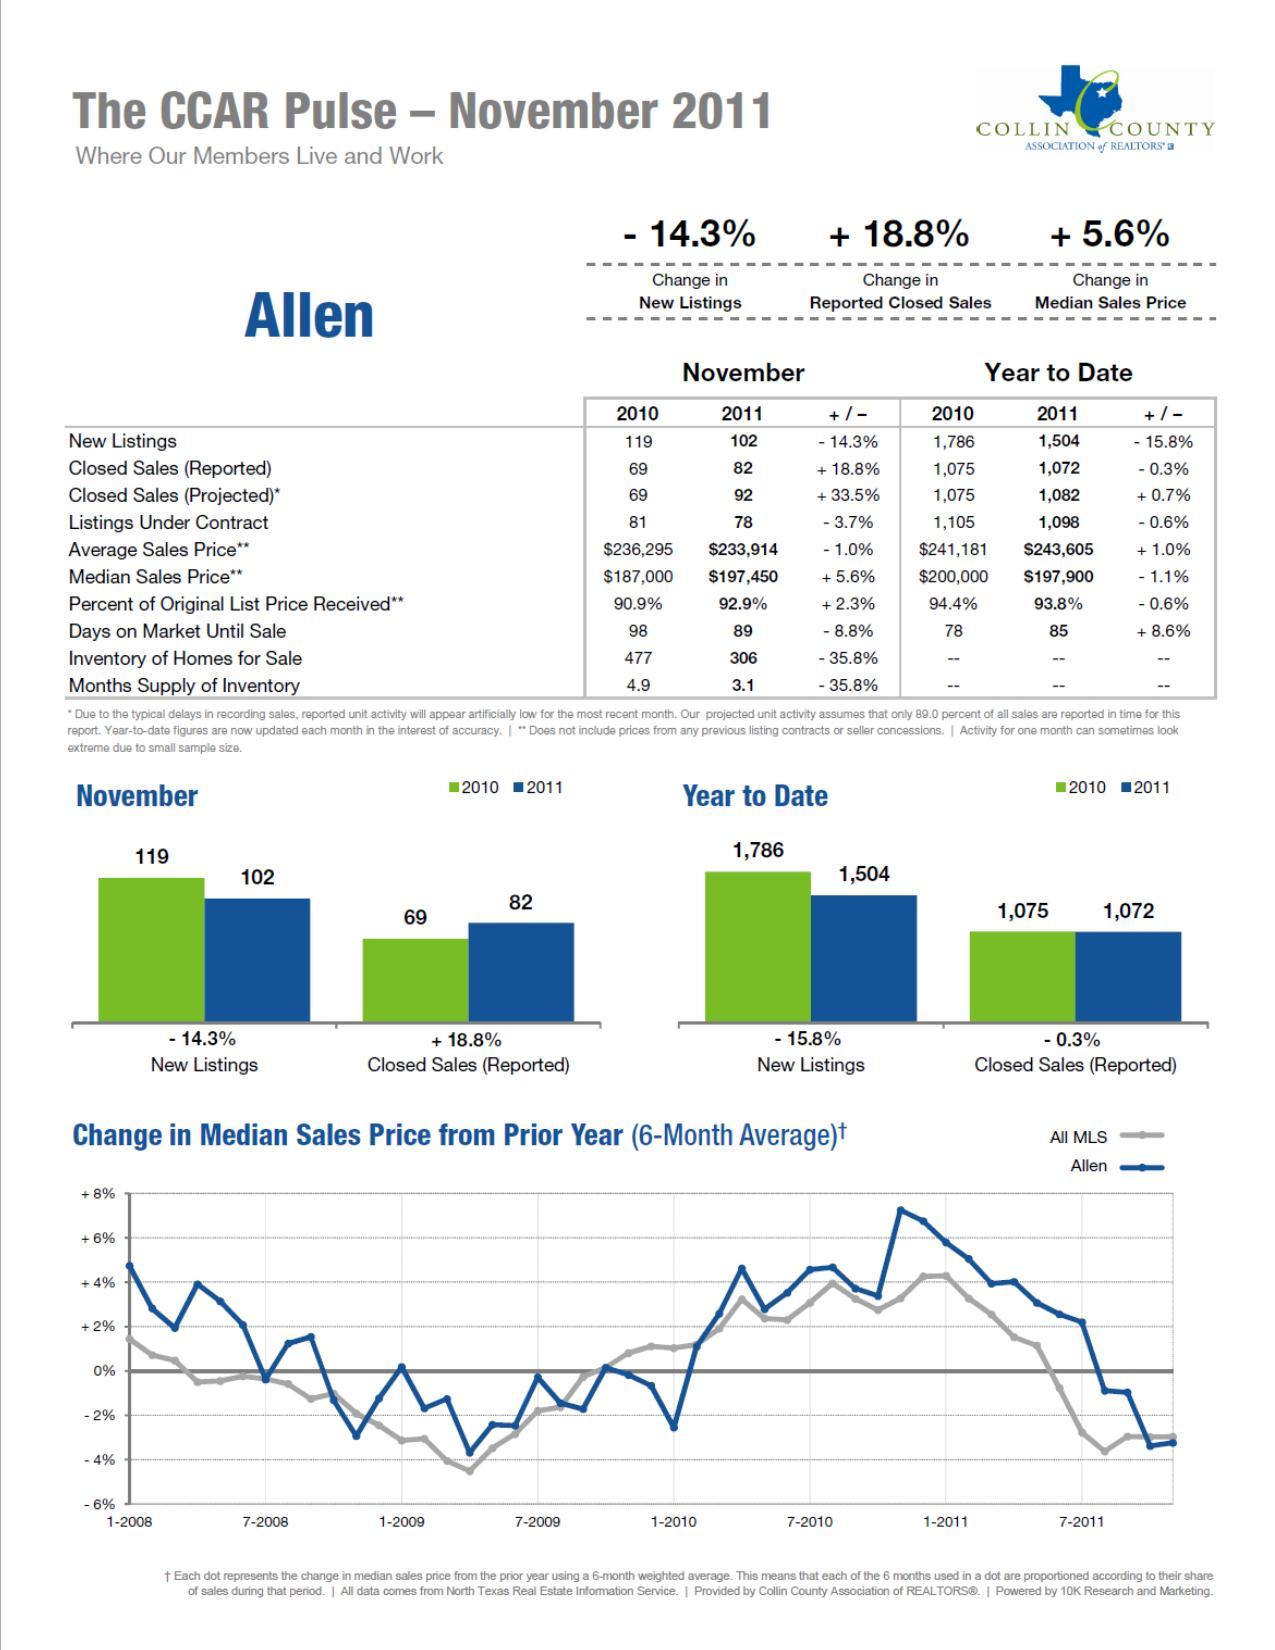 Allen November